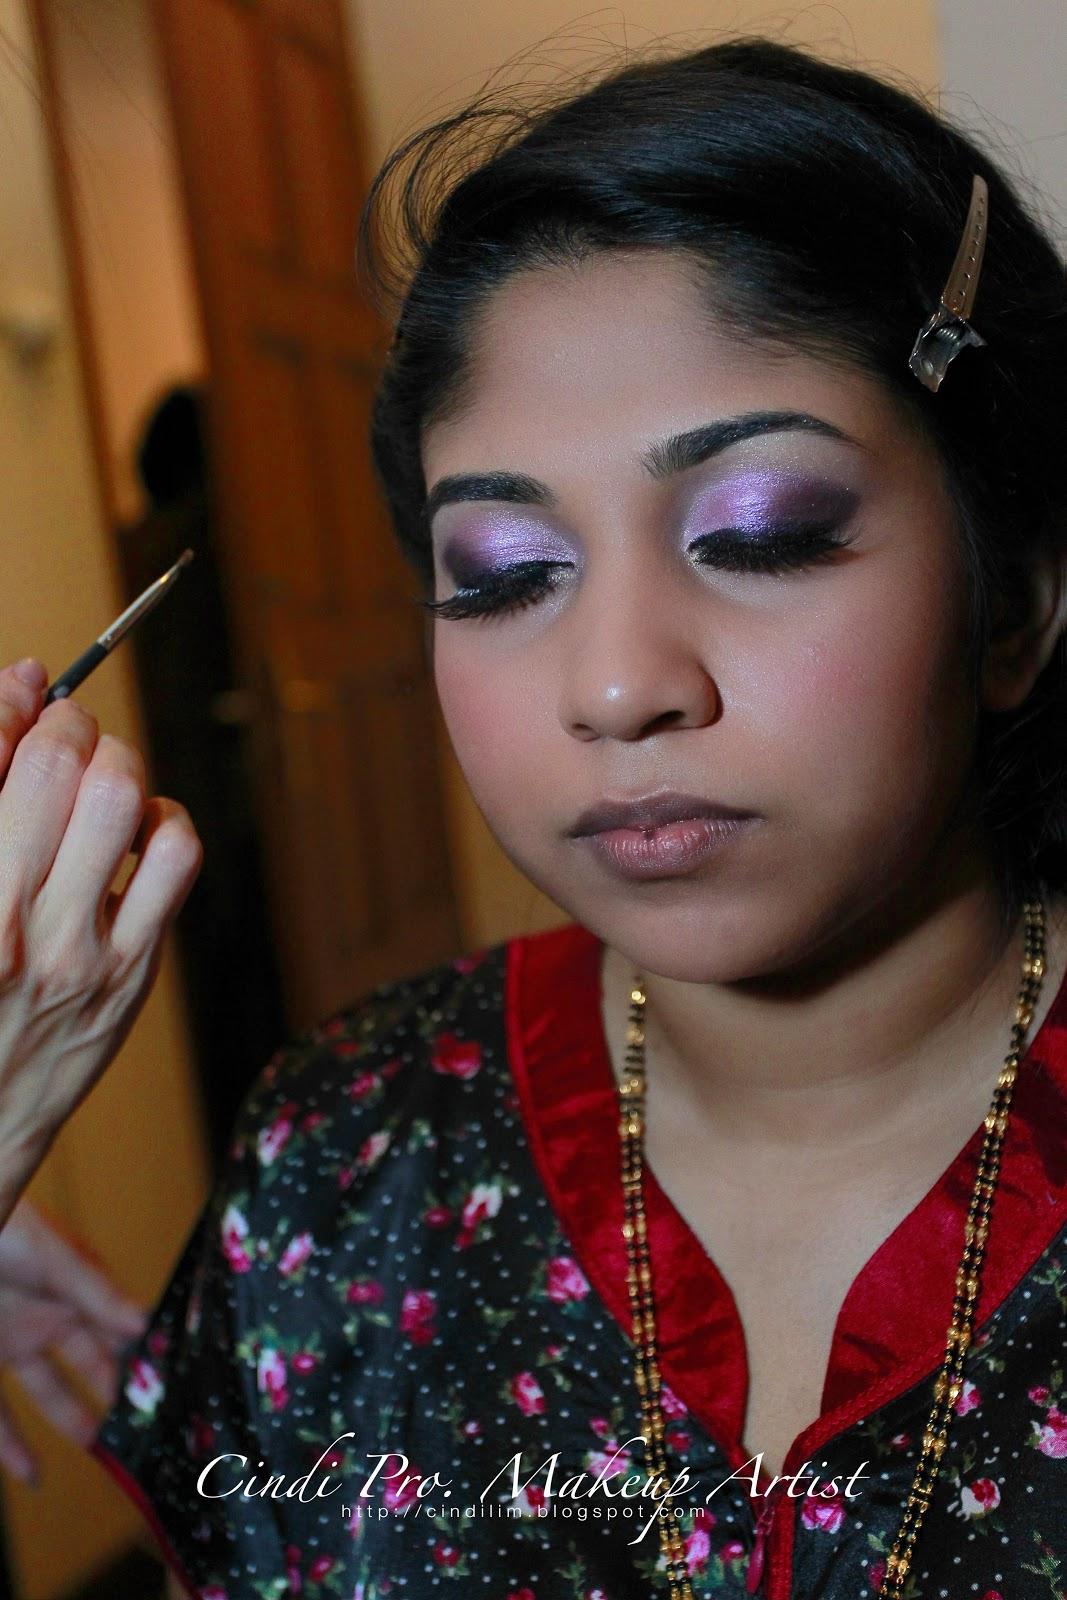 Cindi Pro Makeup Artist Commercial Photoshoot Makeup: :: Cindi Pro. Makeup Artist ::: Reception Night Of Miss Katiza